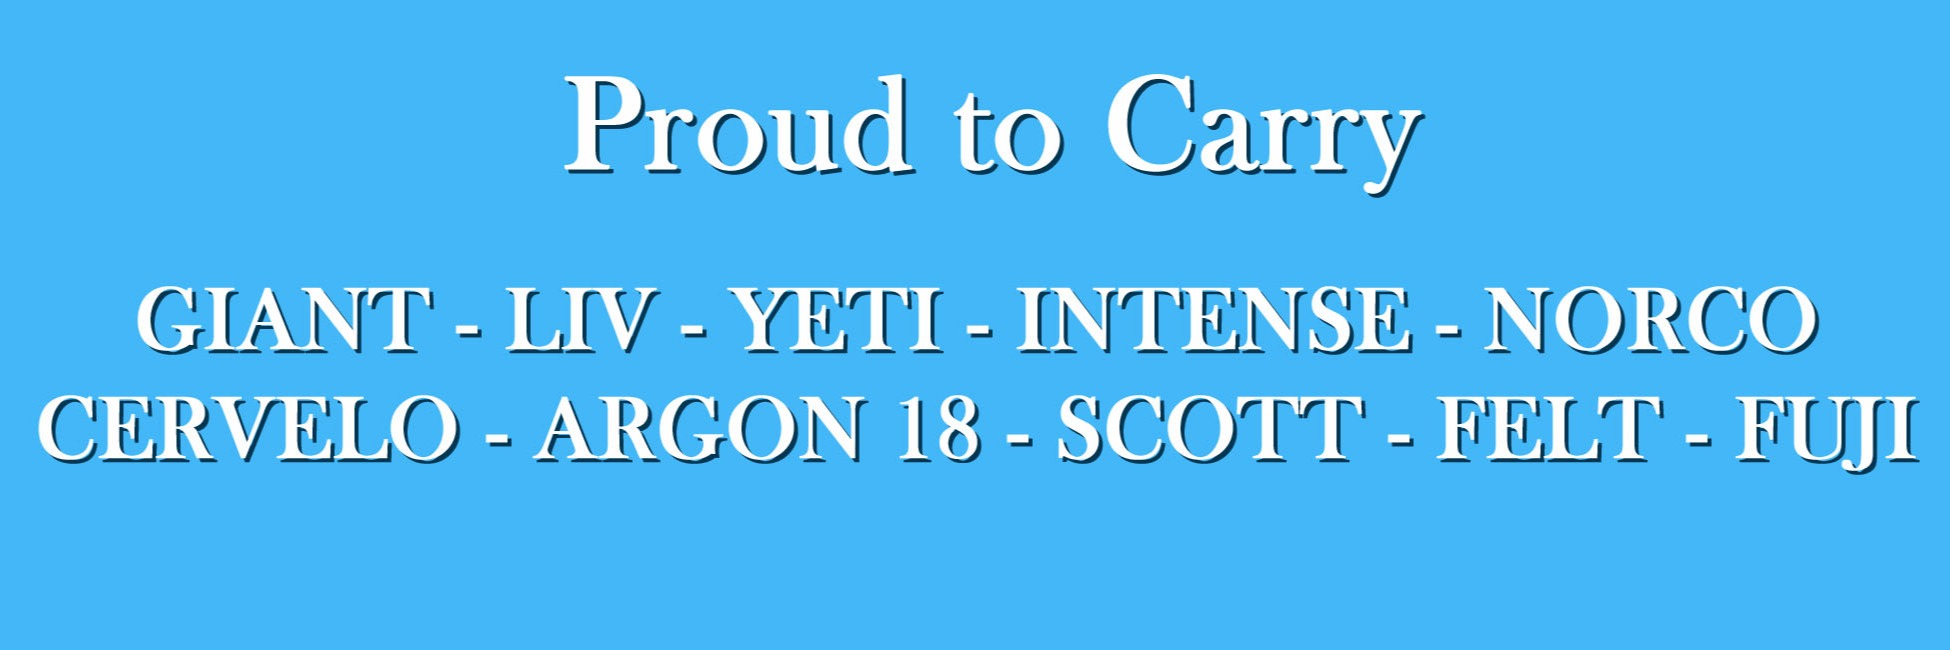 Proud to carry Giant, Liv, Cervelo, Scott, Argon 18, Yeti, Intense, Norco and Felt